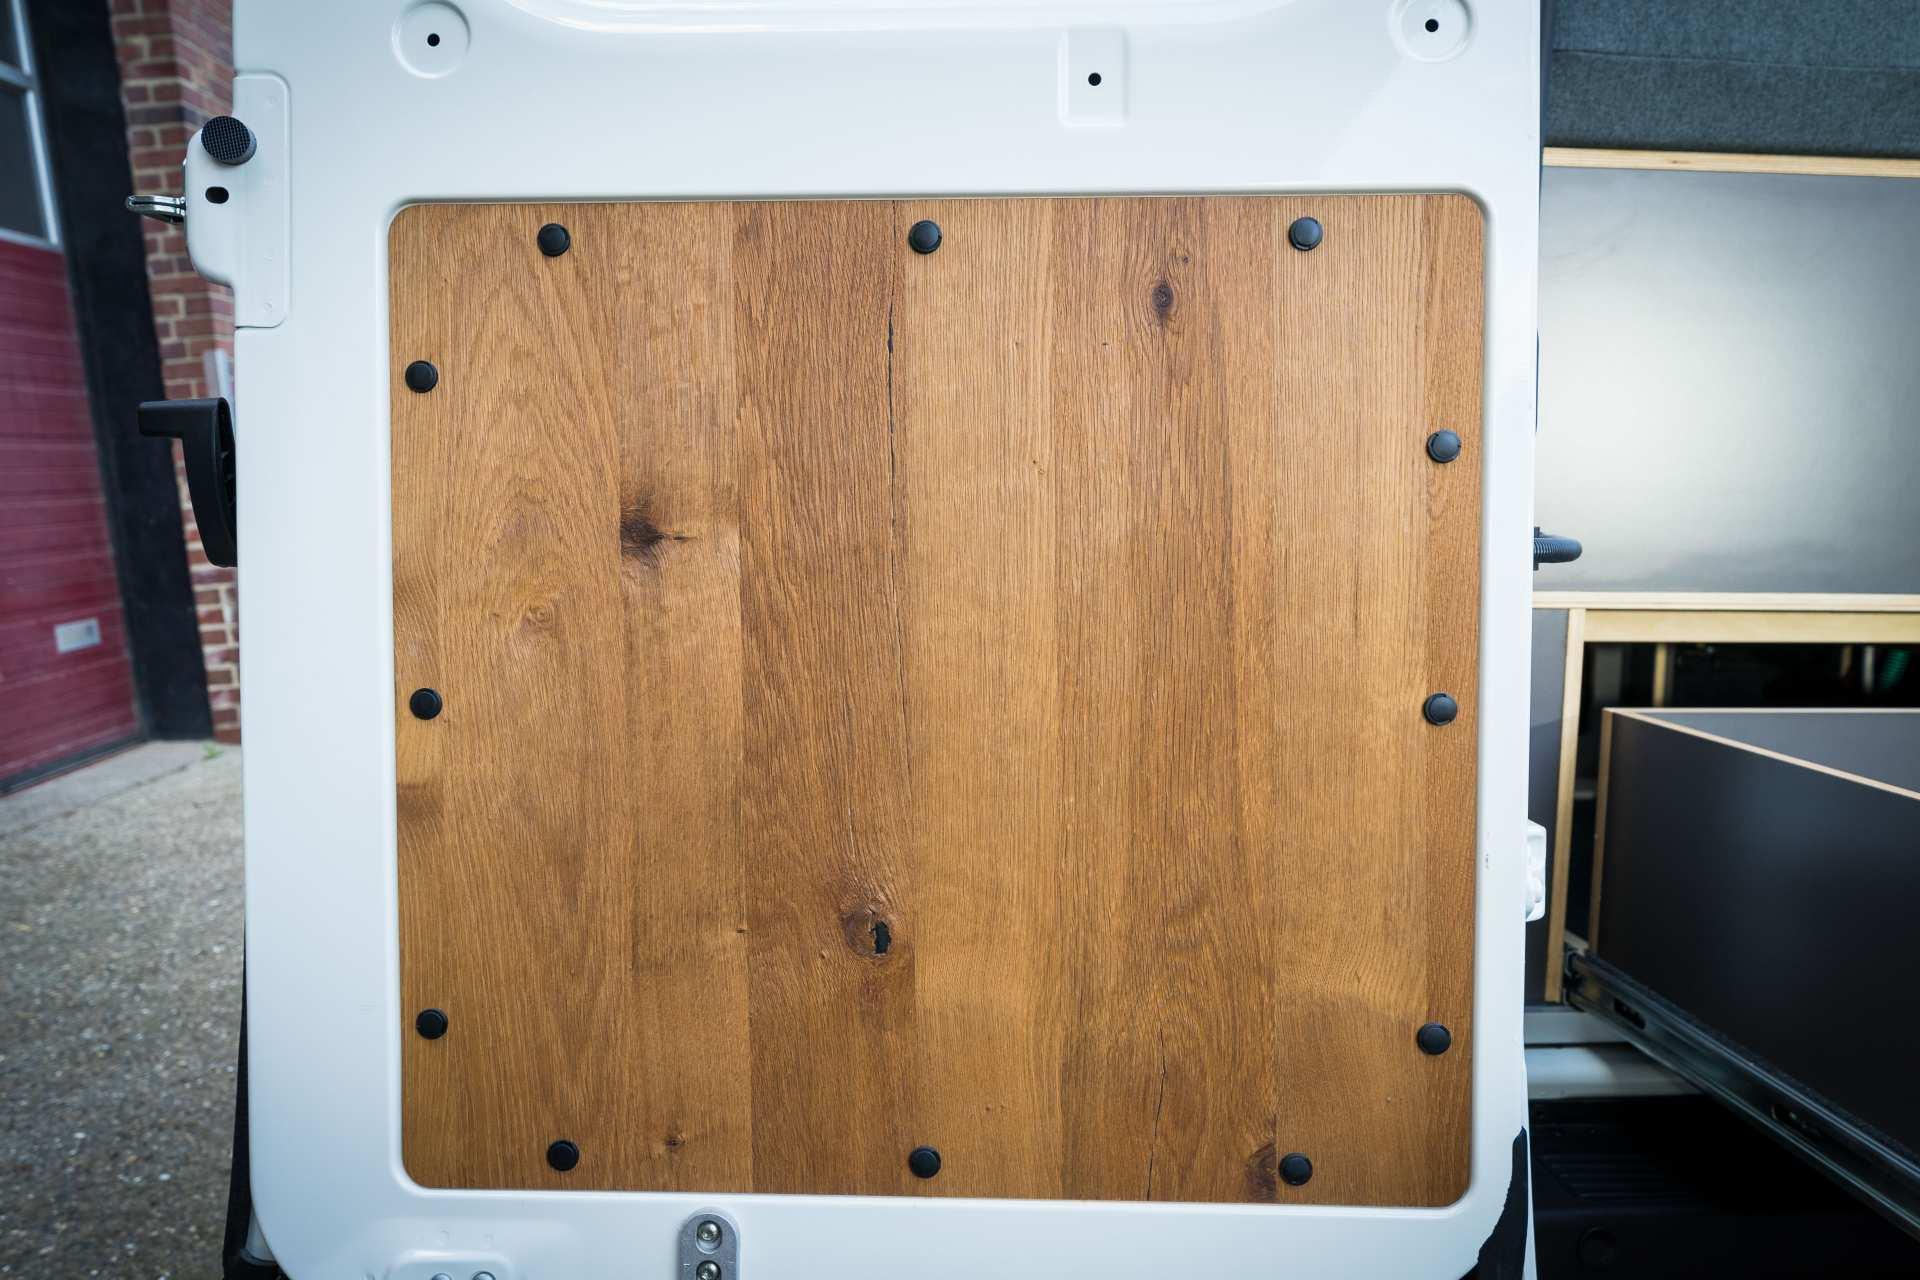 Individualausbau: Zwei-Raumwohnung Peugeot Boxer L2 H2 - 40